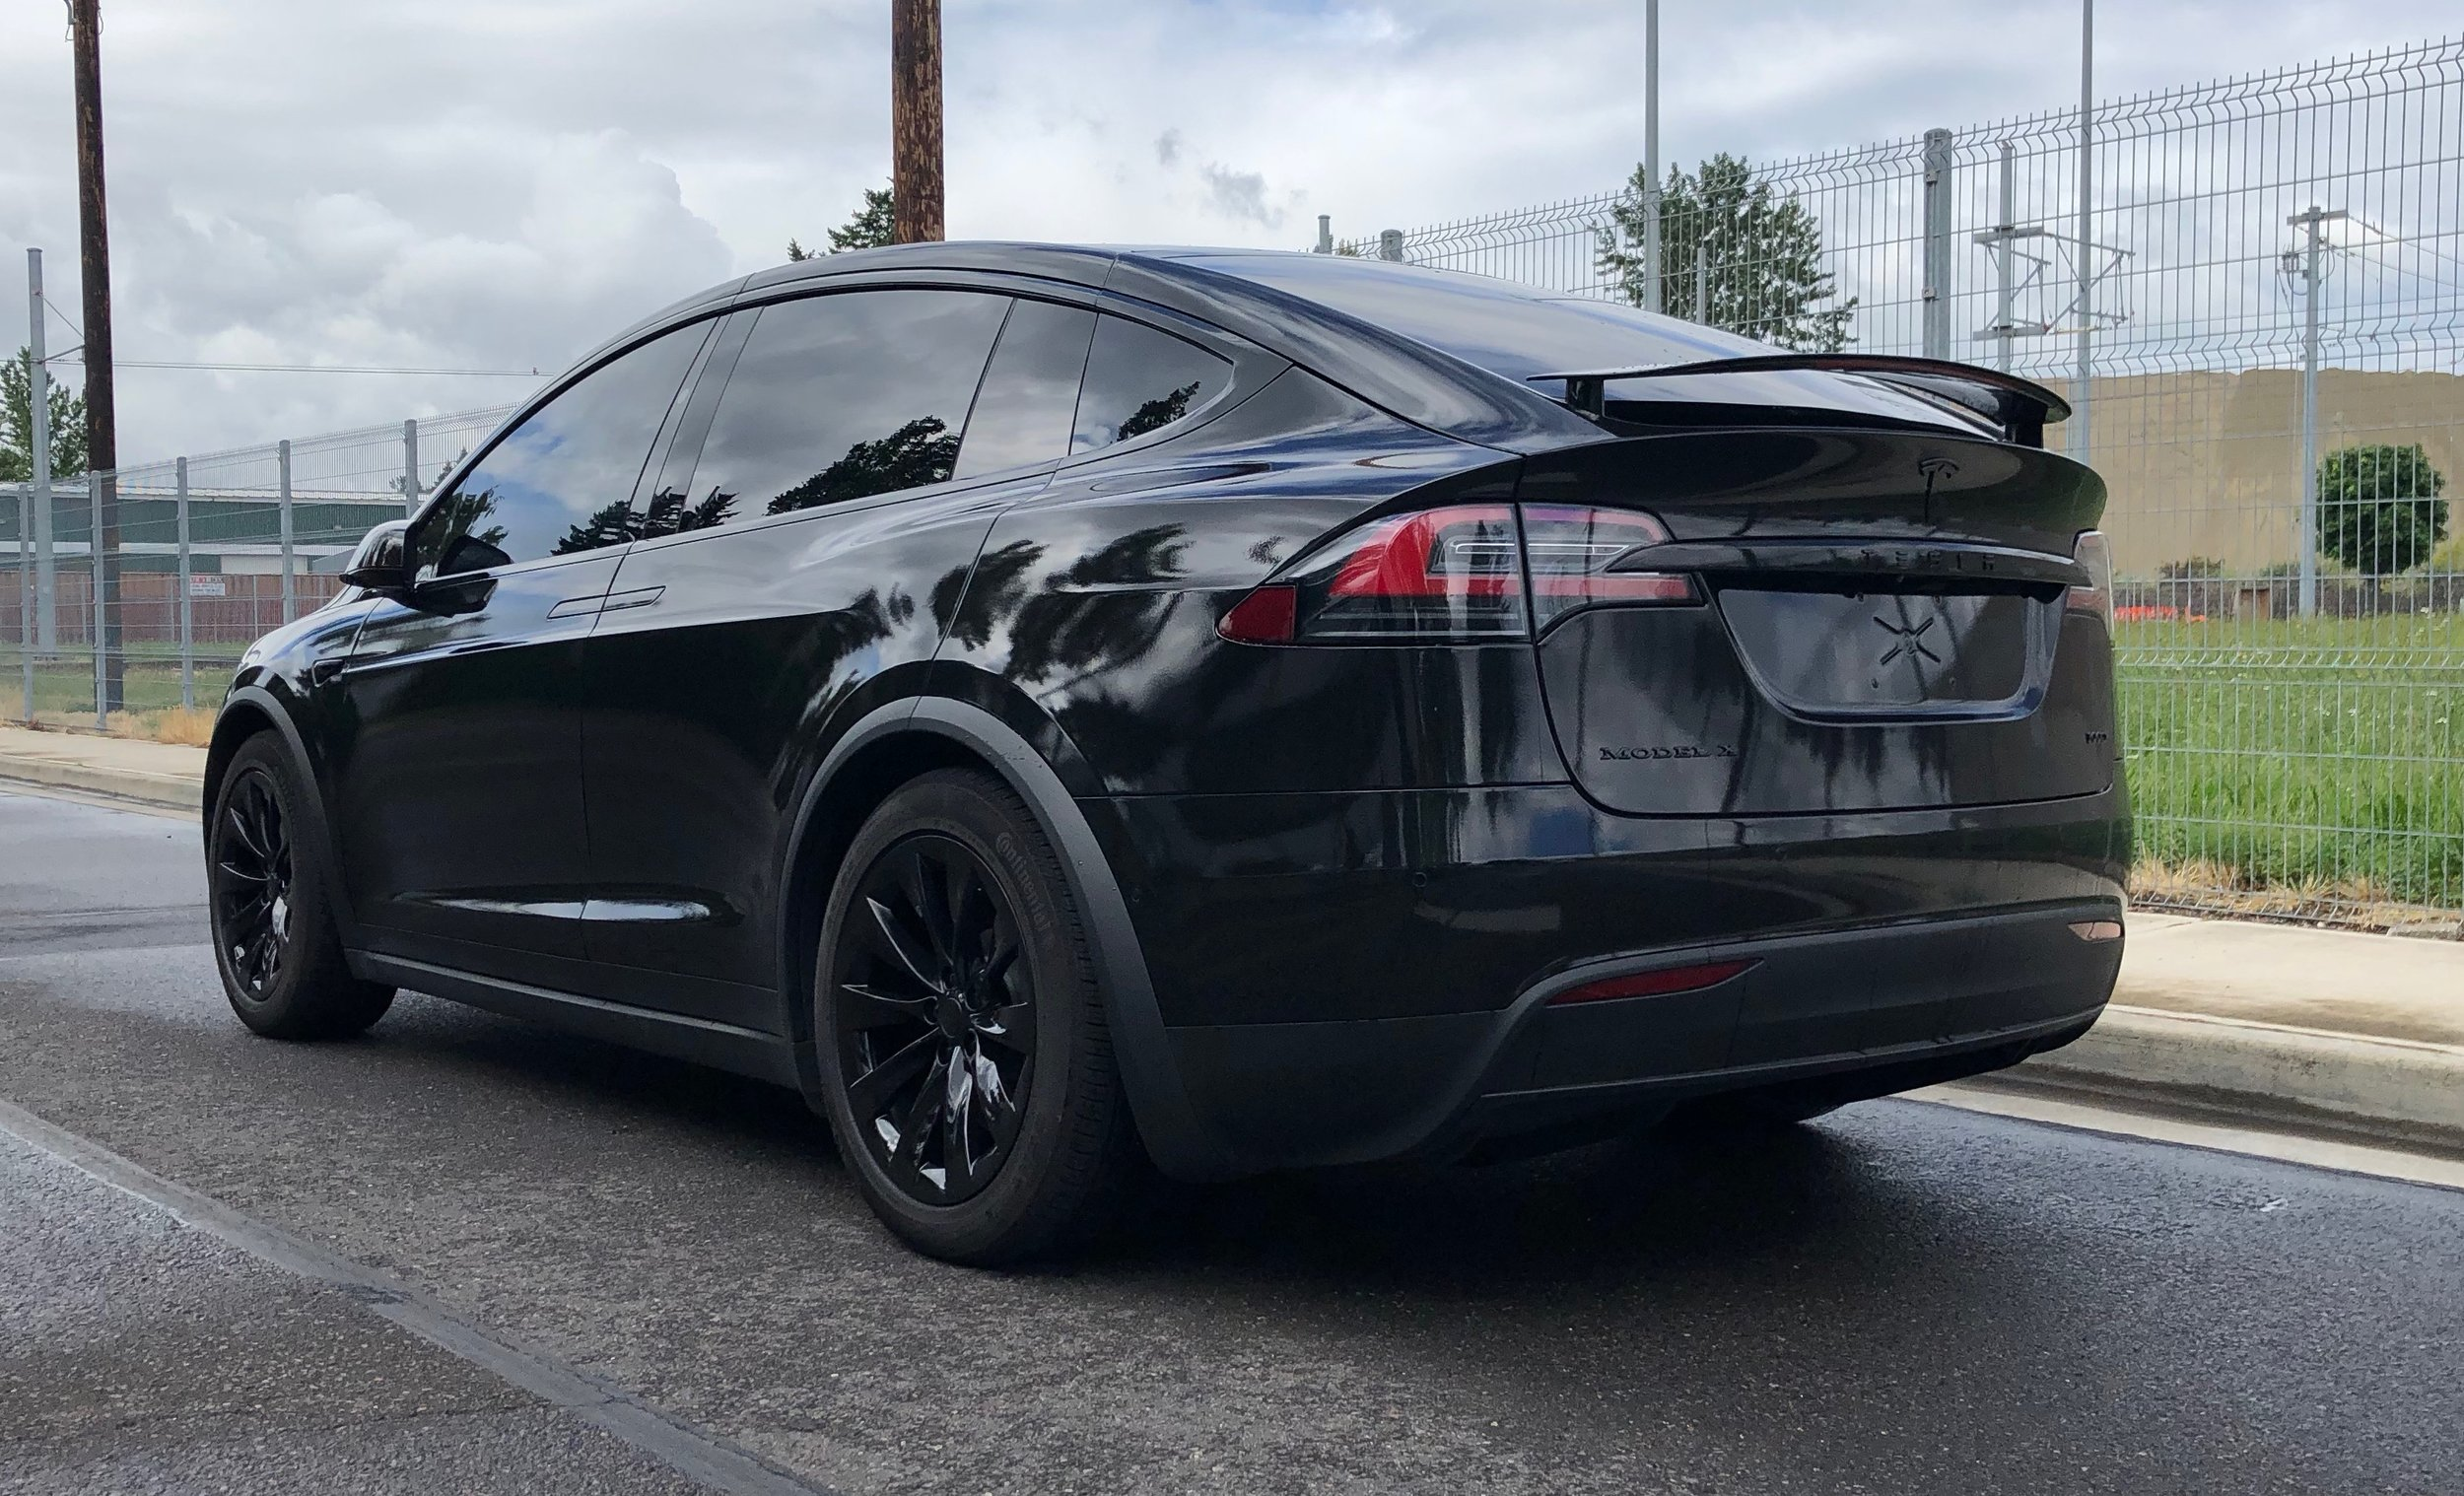 Gloss Black AutoFlex Body, Wheels, & Trim